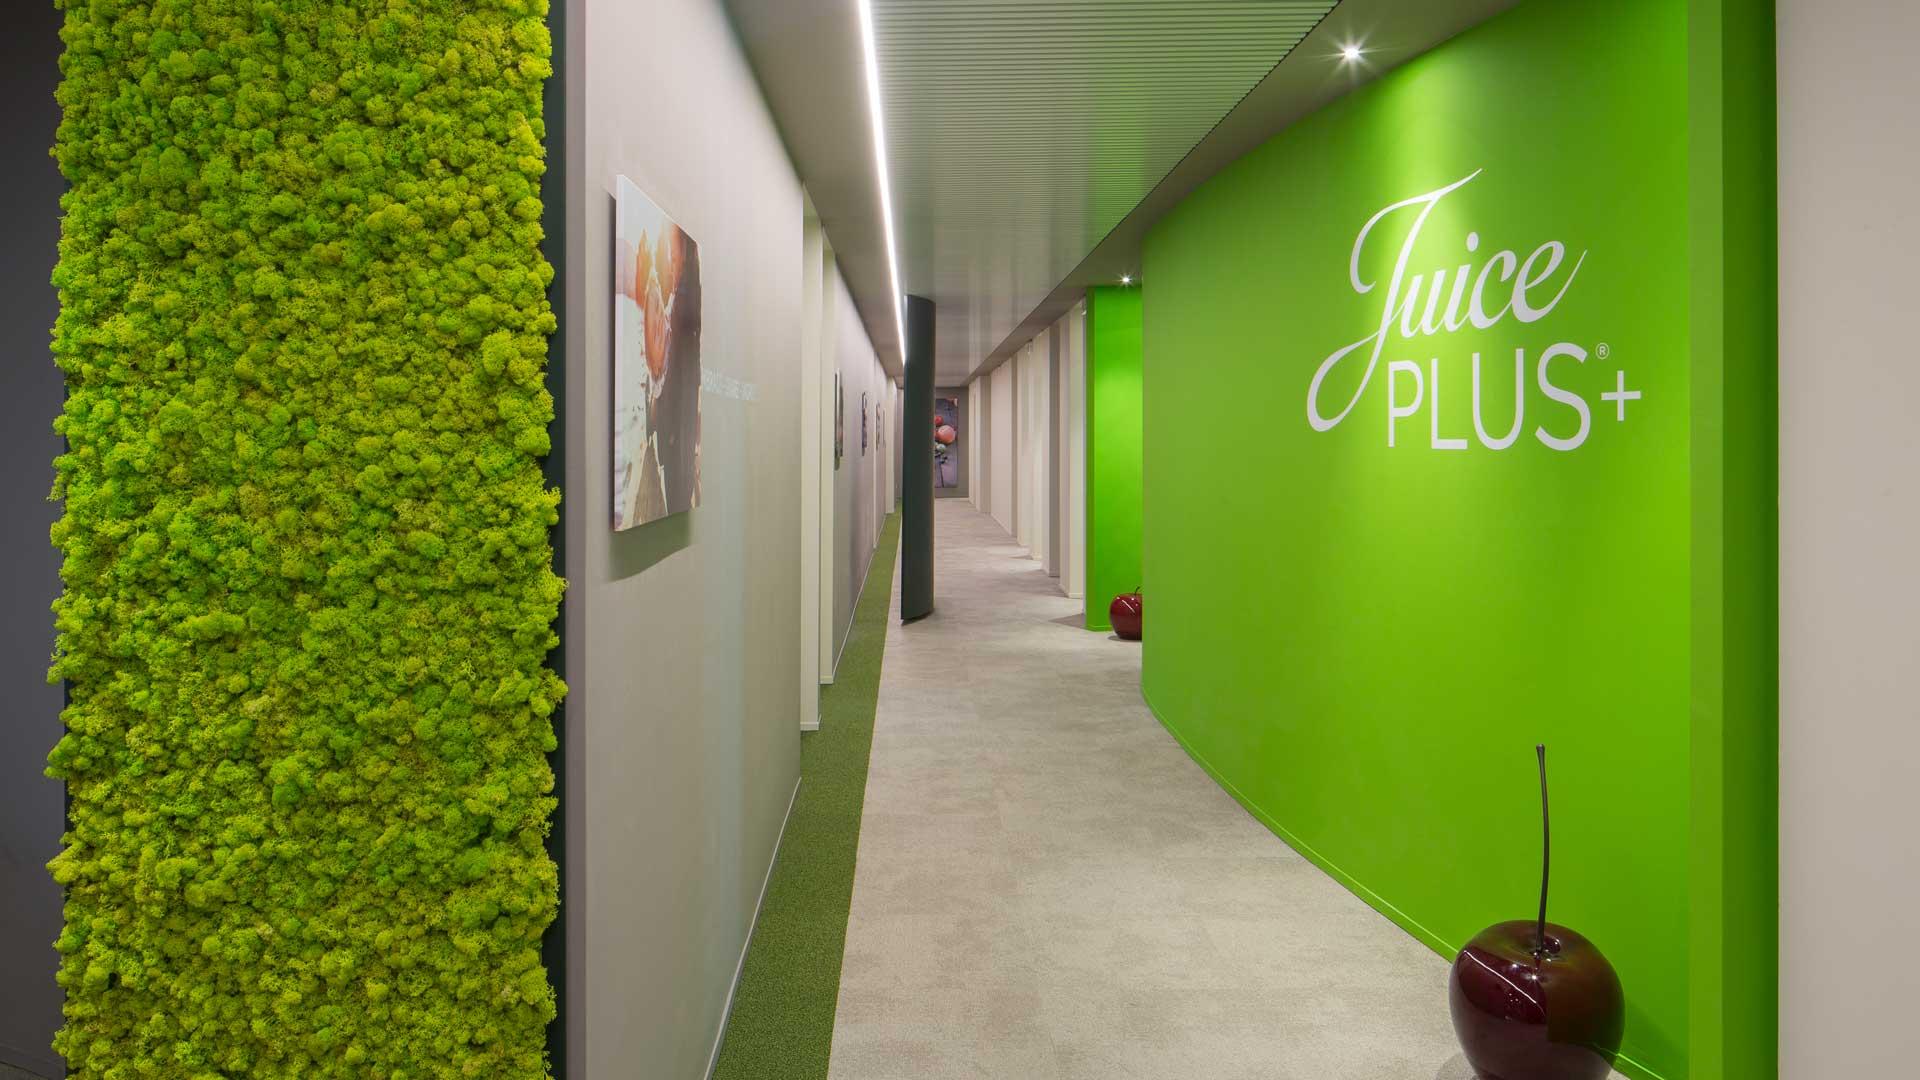 Uffici-per-e-commerce-Juice-Plus-3-Level-Office-Landscape